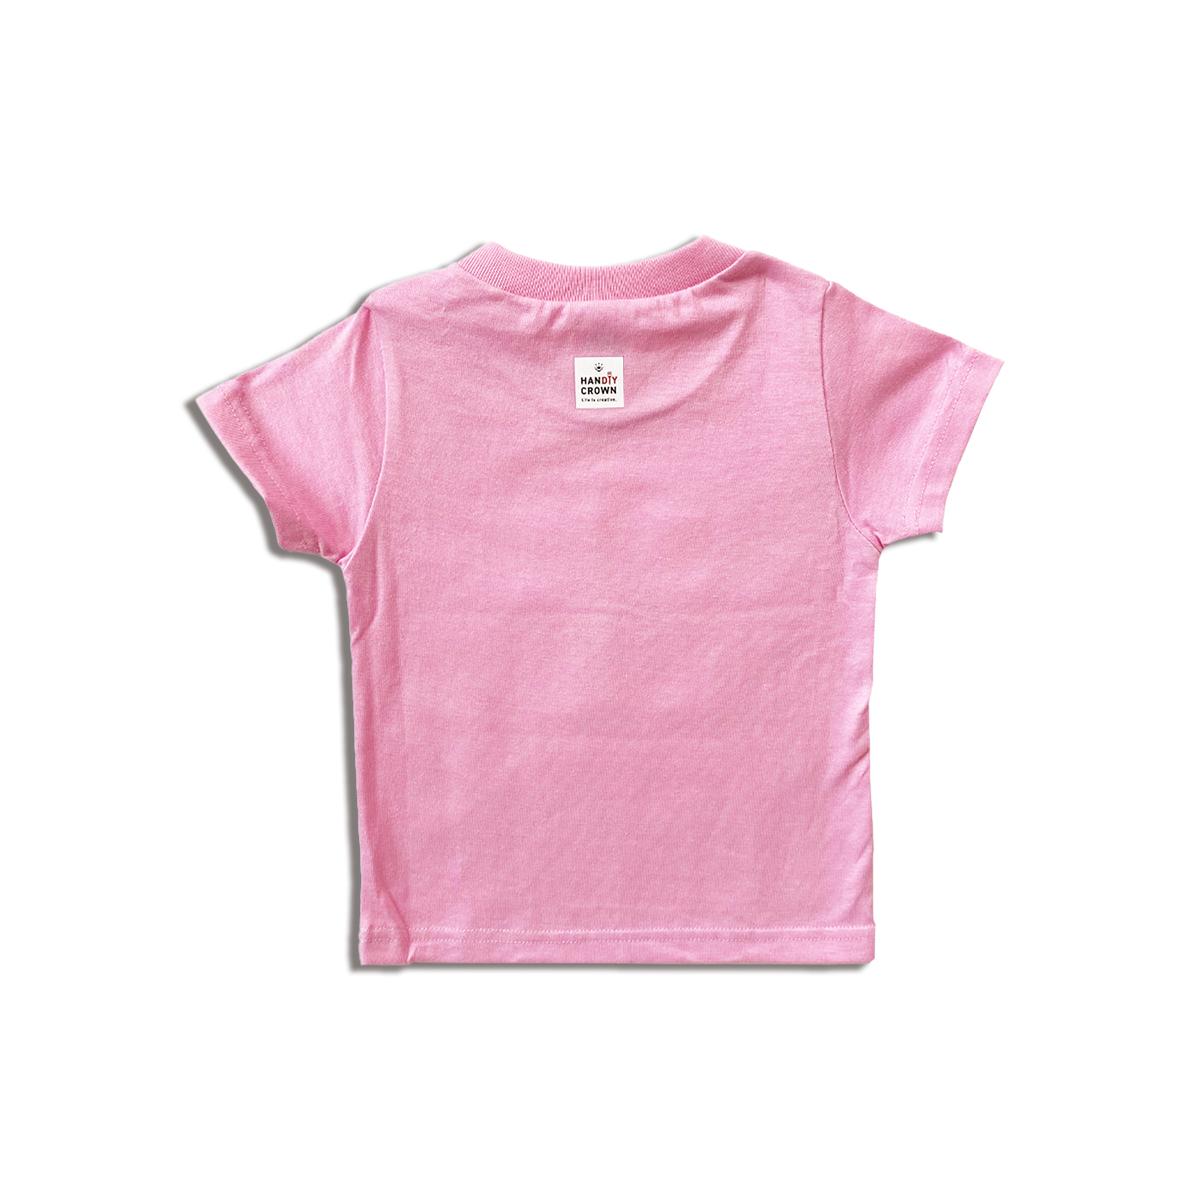 Tシャツ 子供用 ピンク